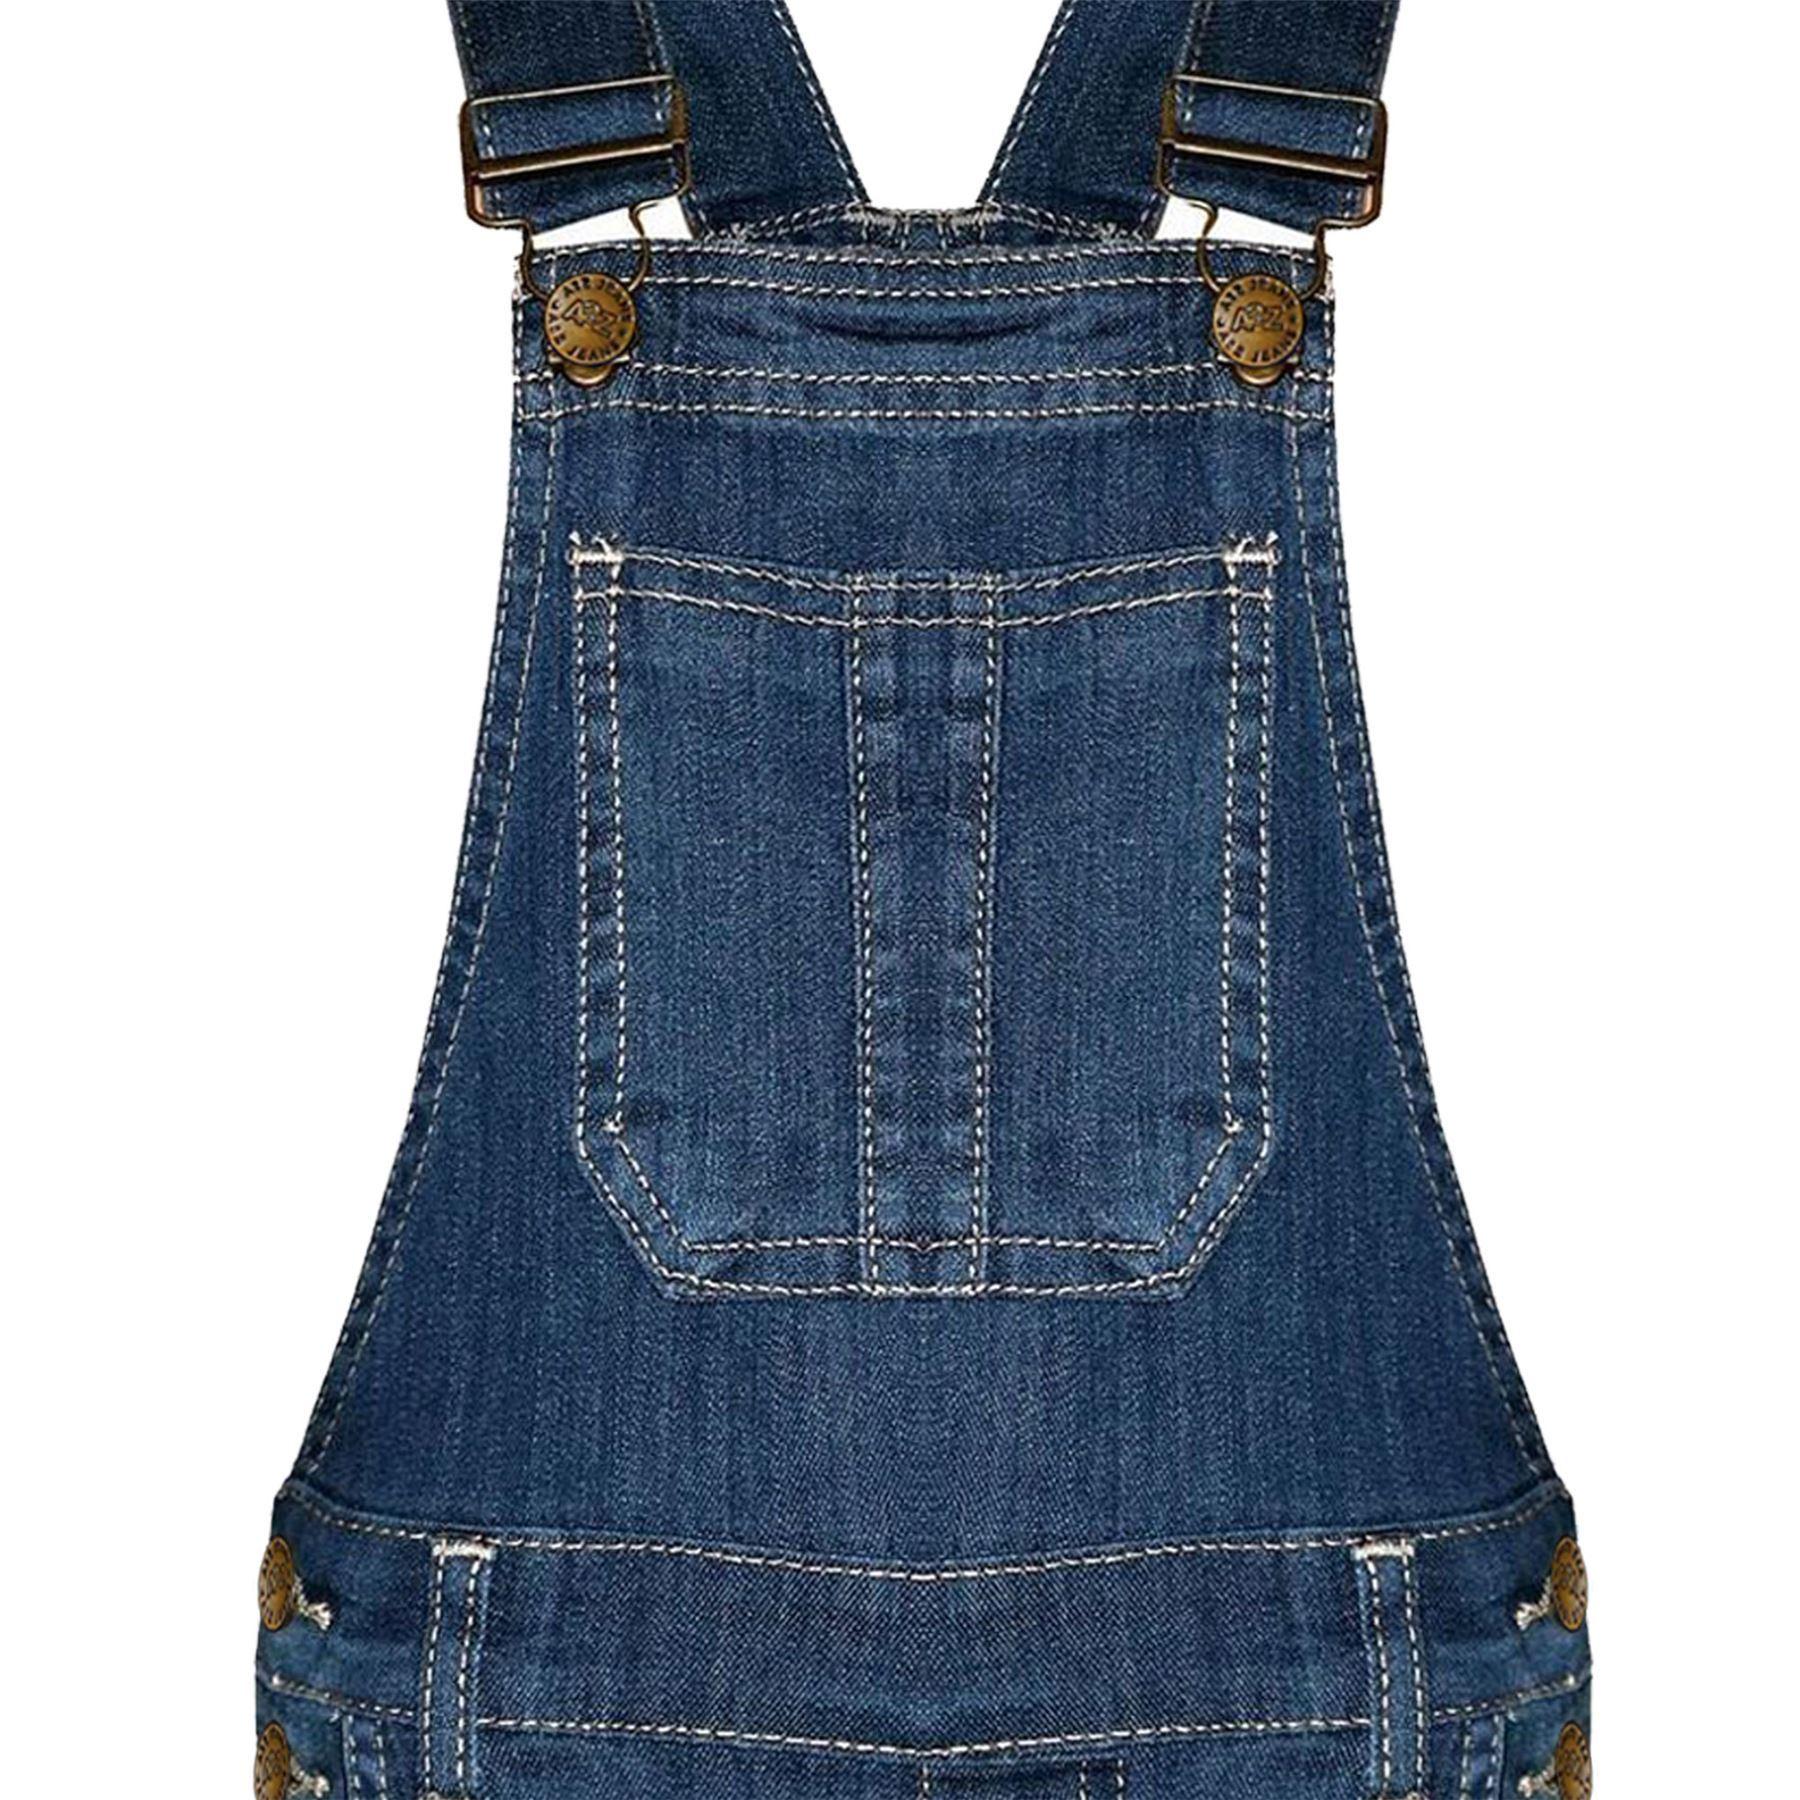 Kids Girls Dungaree Shorts Dark Blue Denim Stretch Jumpsuit Playsuits 5-13 Years